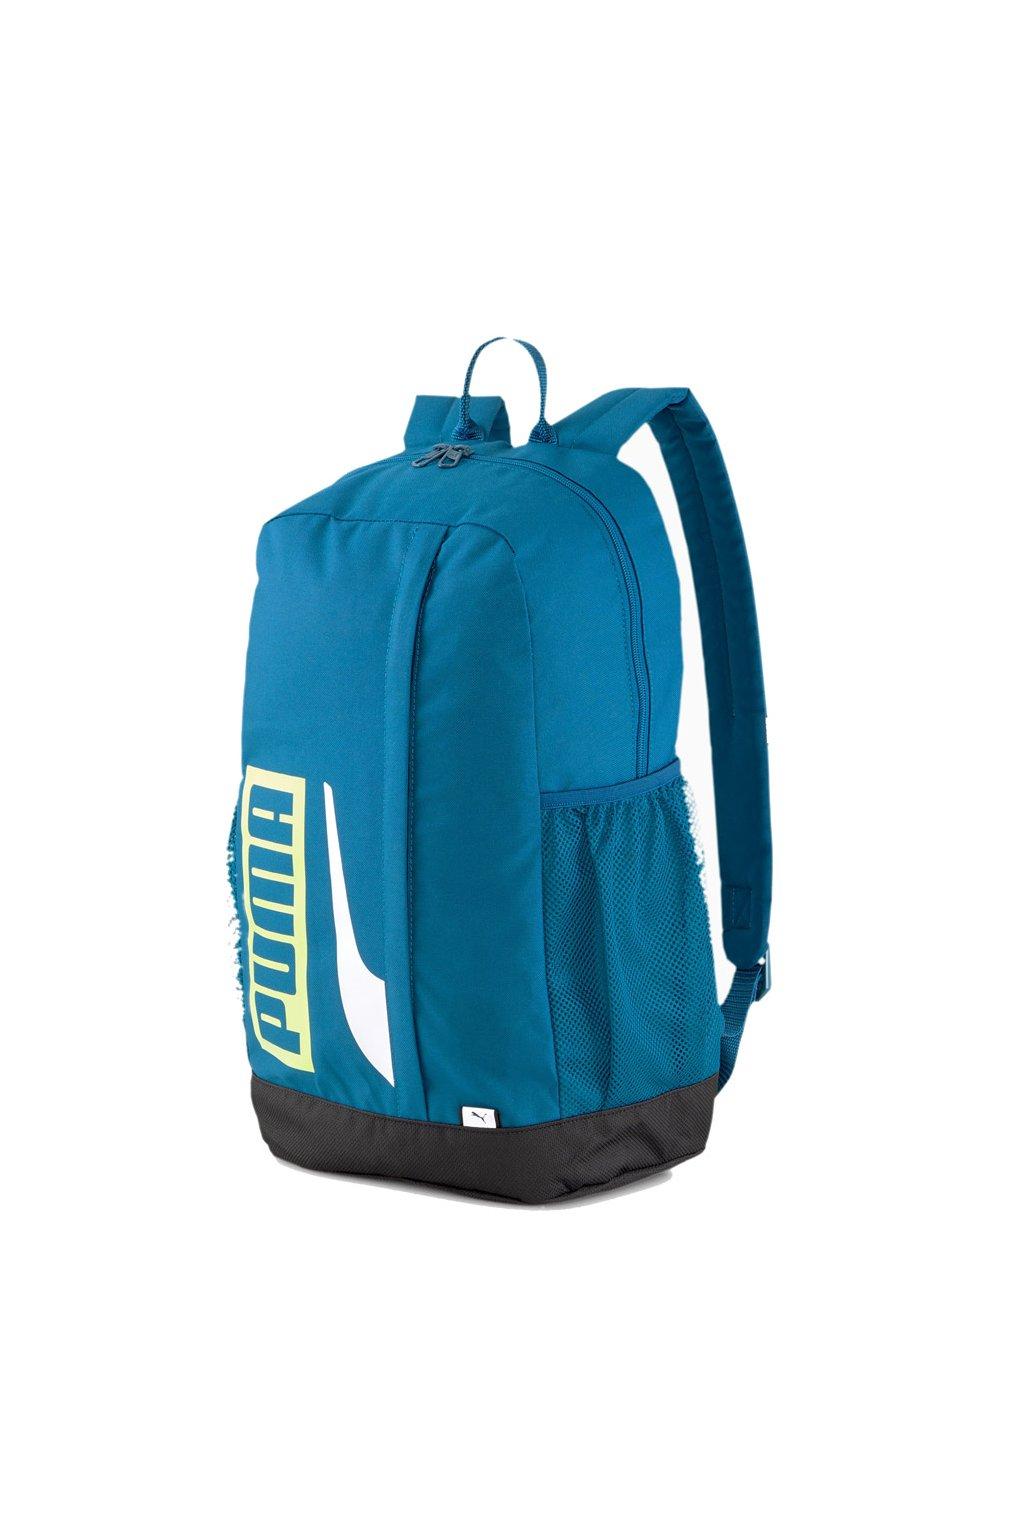 Batoh Puma Plus II modrý 075749 17